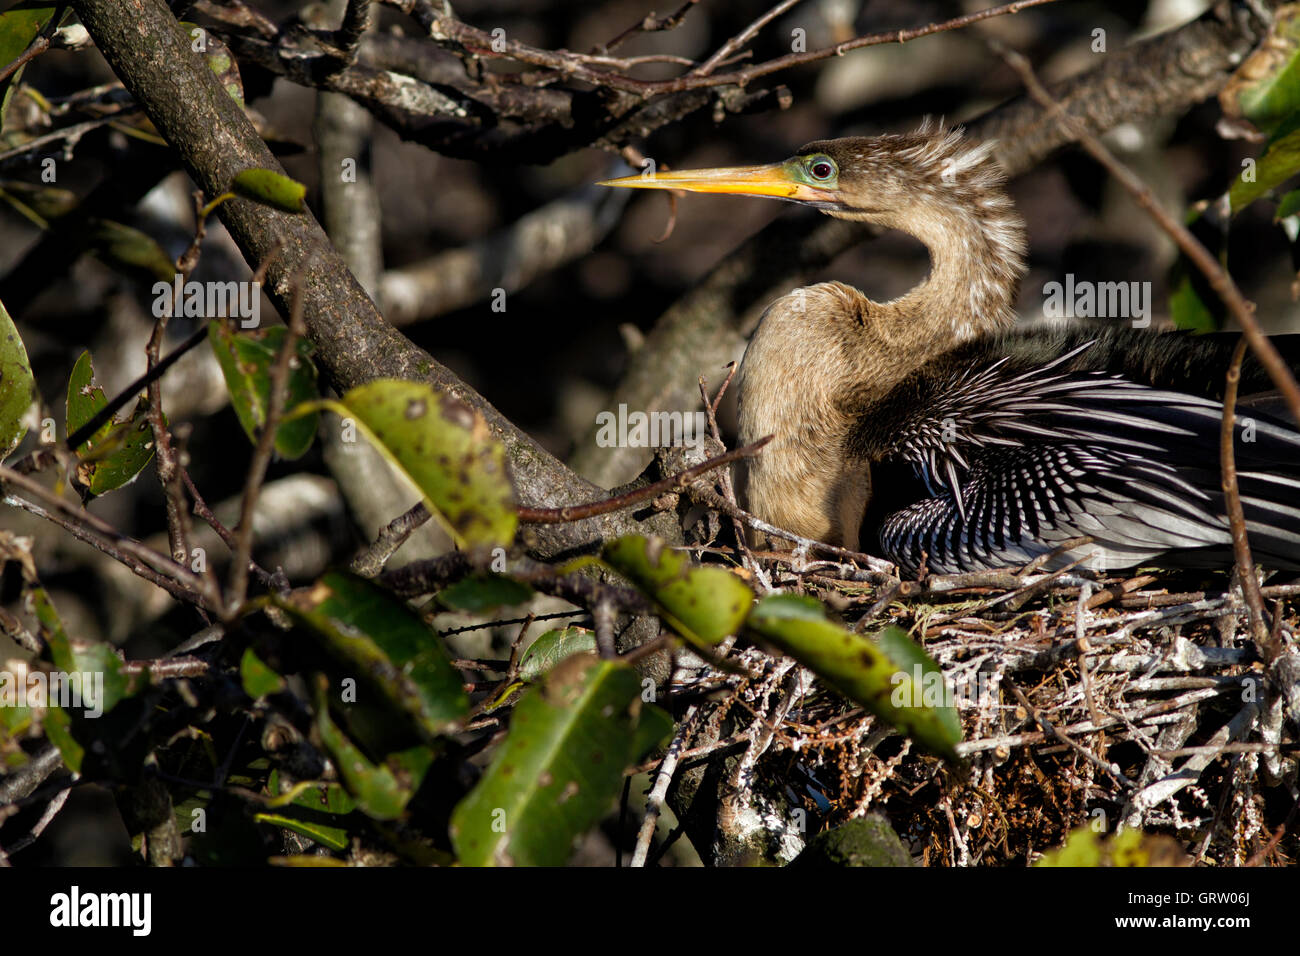 Female Anhinga anhinga sits on her nest incubating eggs. Like the male she has a ruby eye and greenish blue lore. - Stock Image